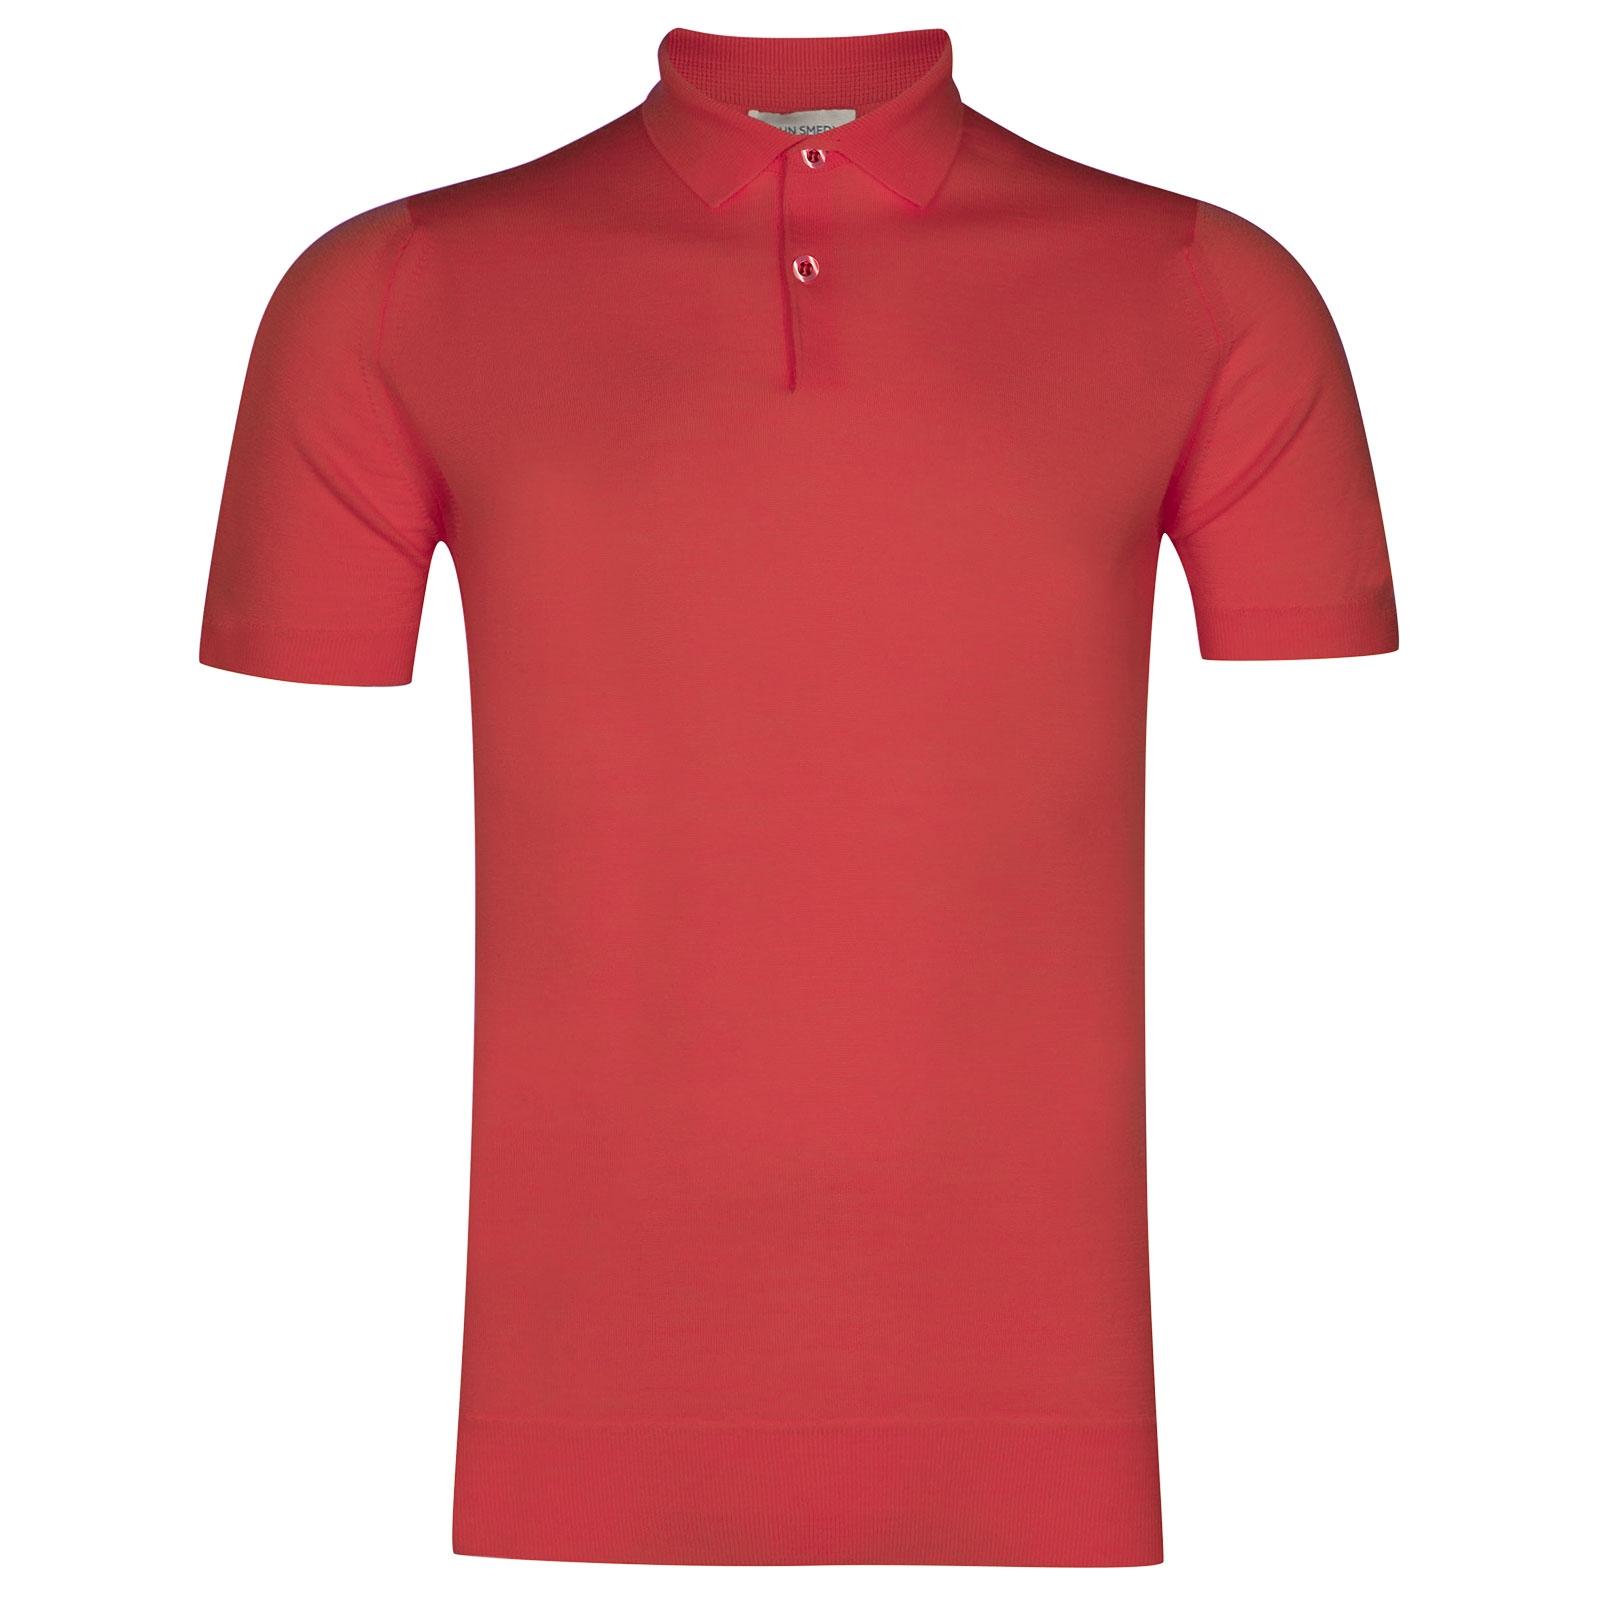 John Smedley Payton Merino Wool Shirt in Ruche Red-L